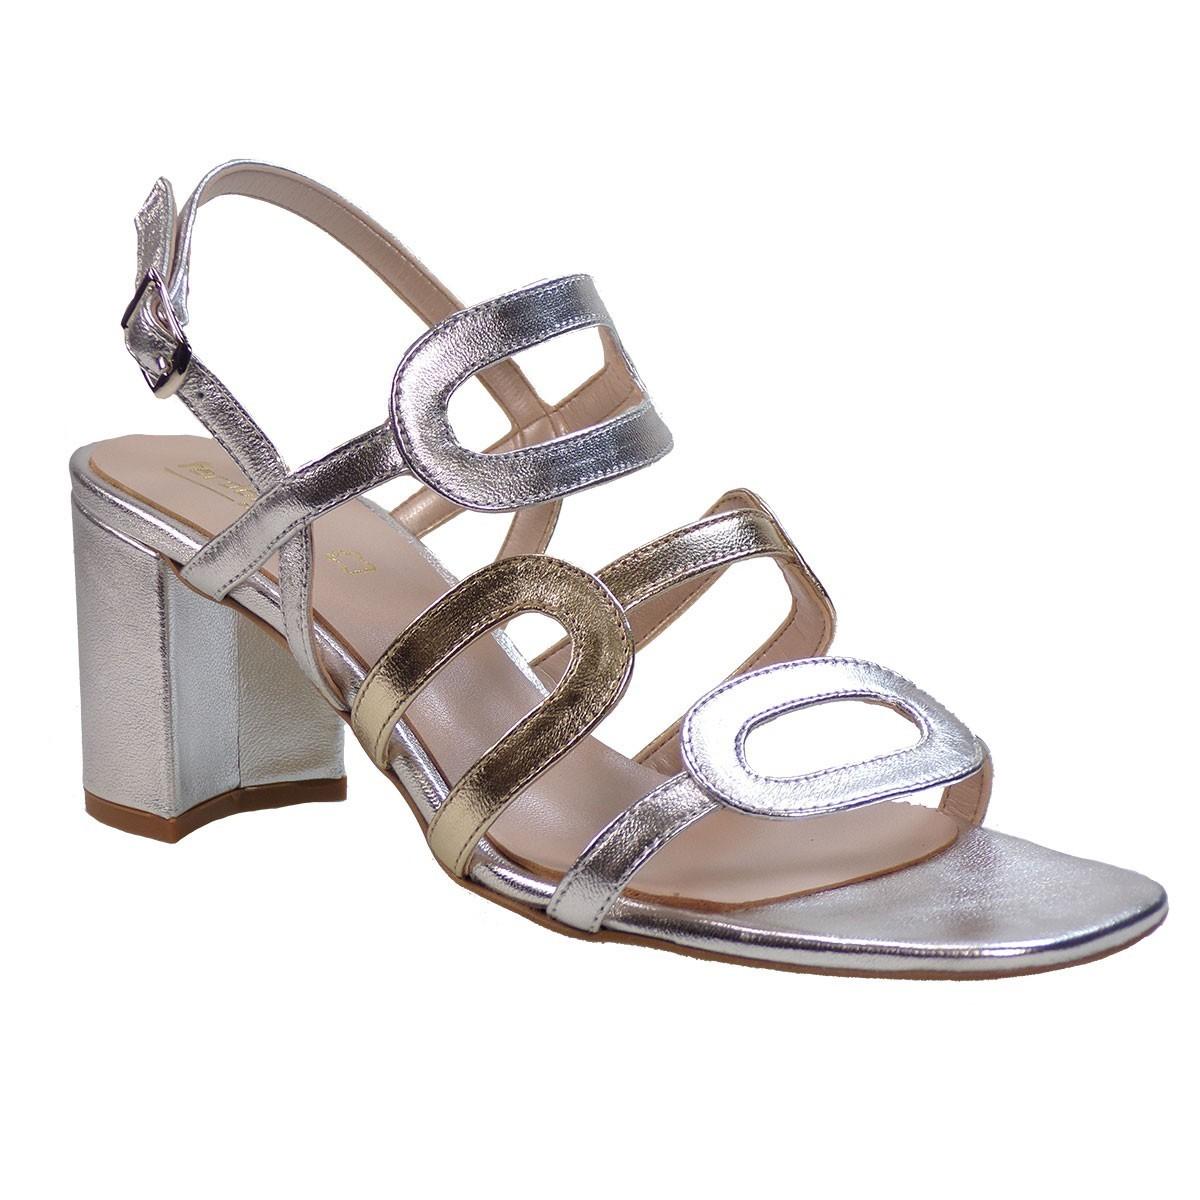 Fardoulis shoes Γυναικεία Παπούτσια Πέδιλα 51226 Aσημί-Πλατίνα Δέρμα